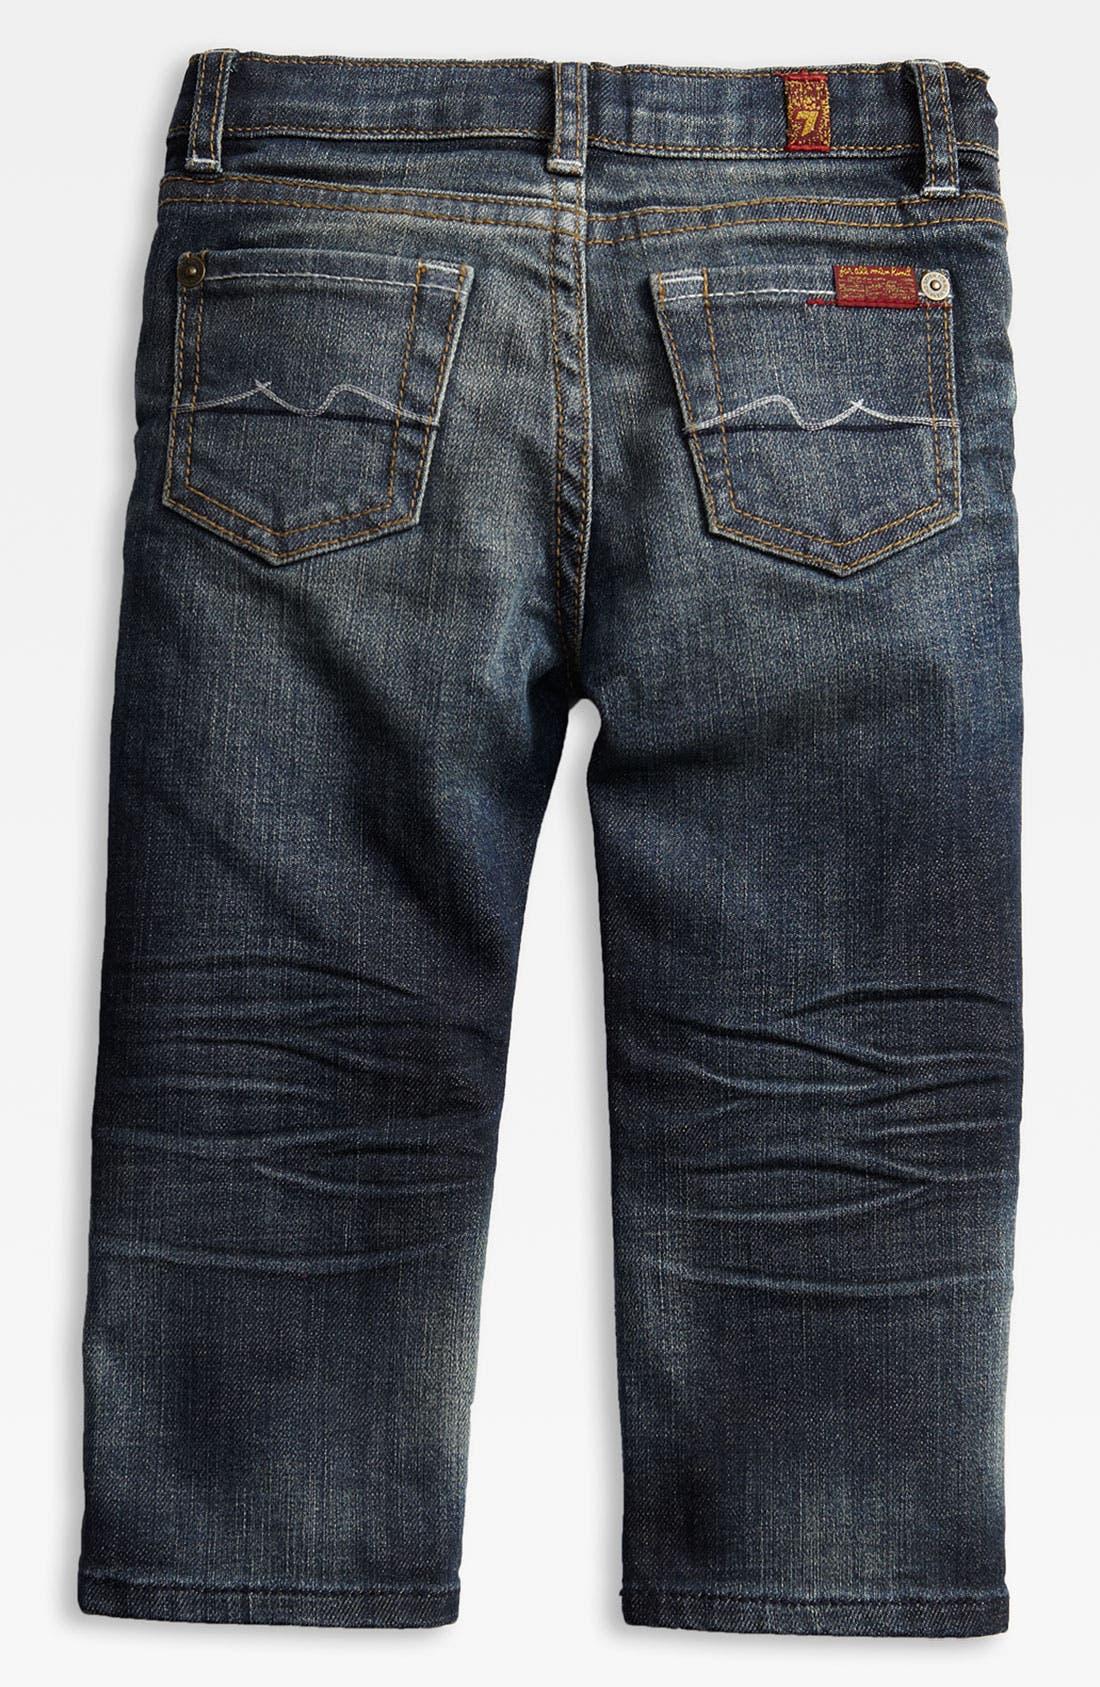 Alternate Image 1 Selected - 7 For All Mankind® 'Standard' Jeans (Toddler)